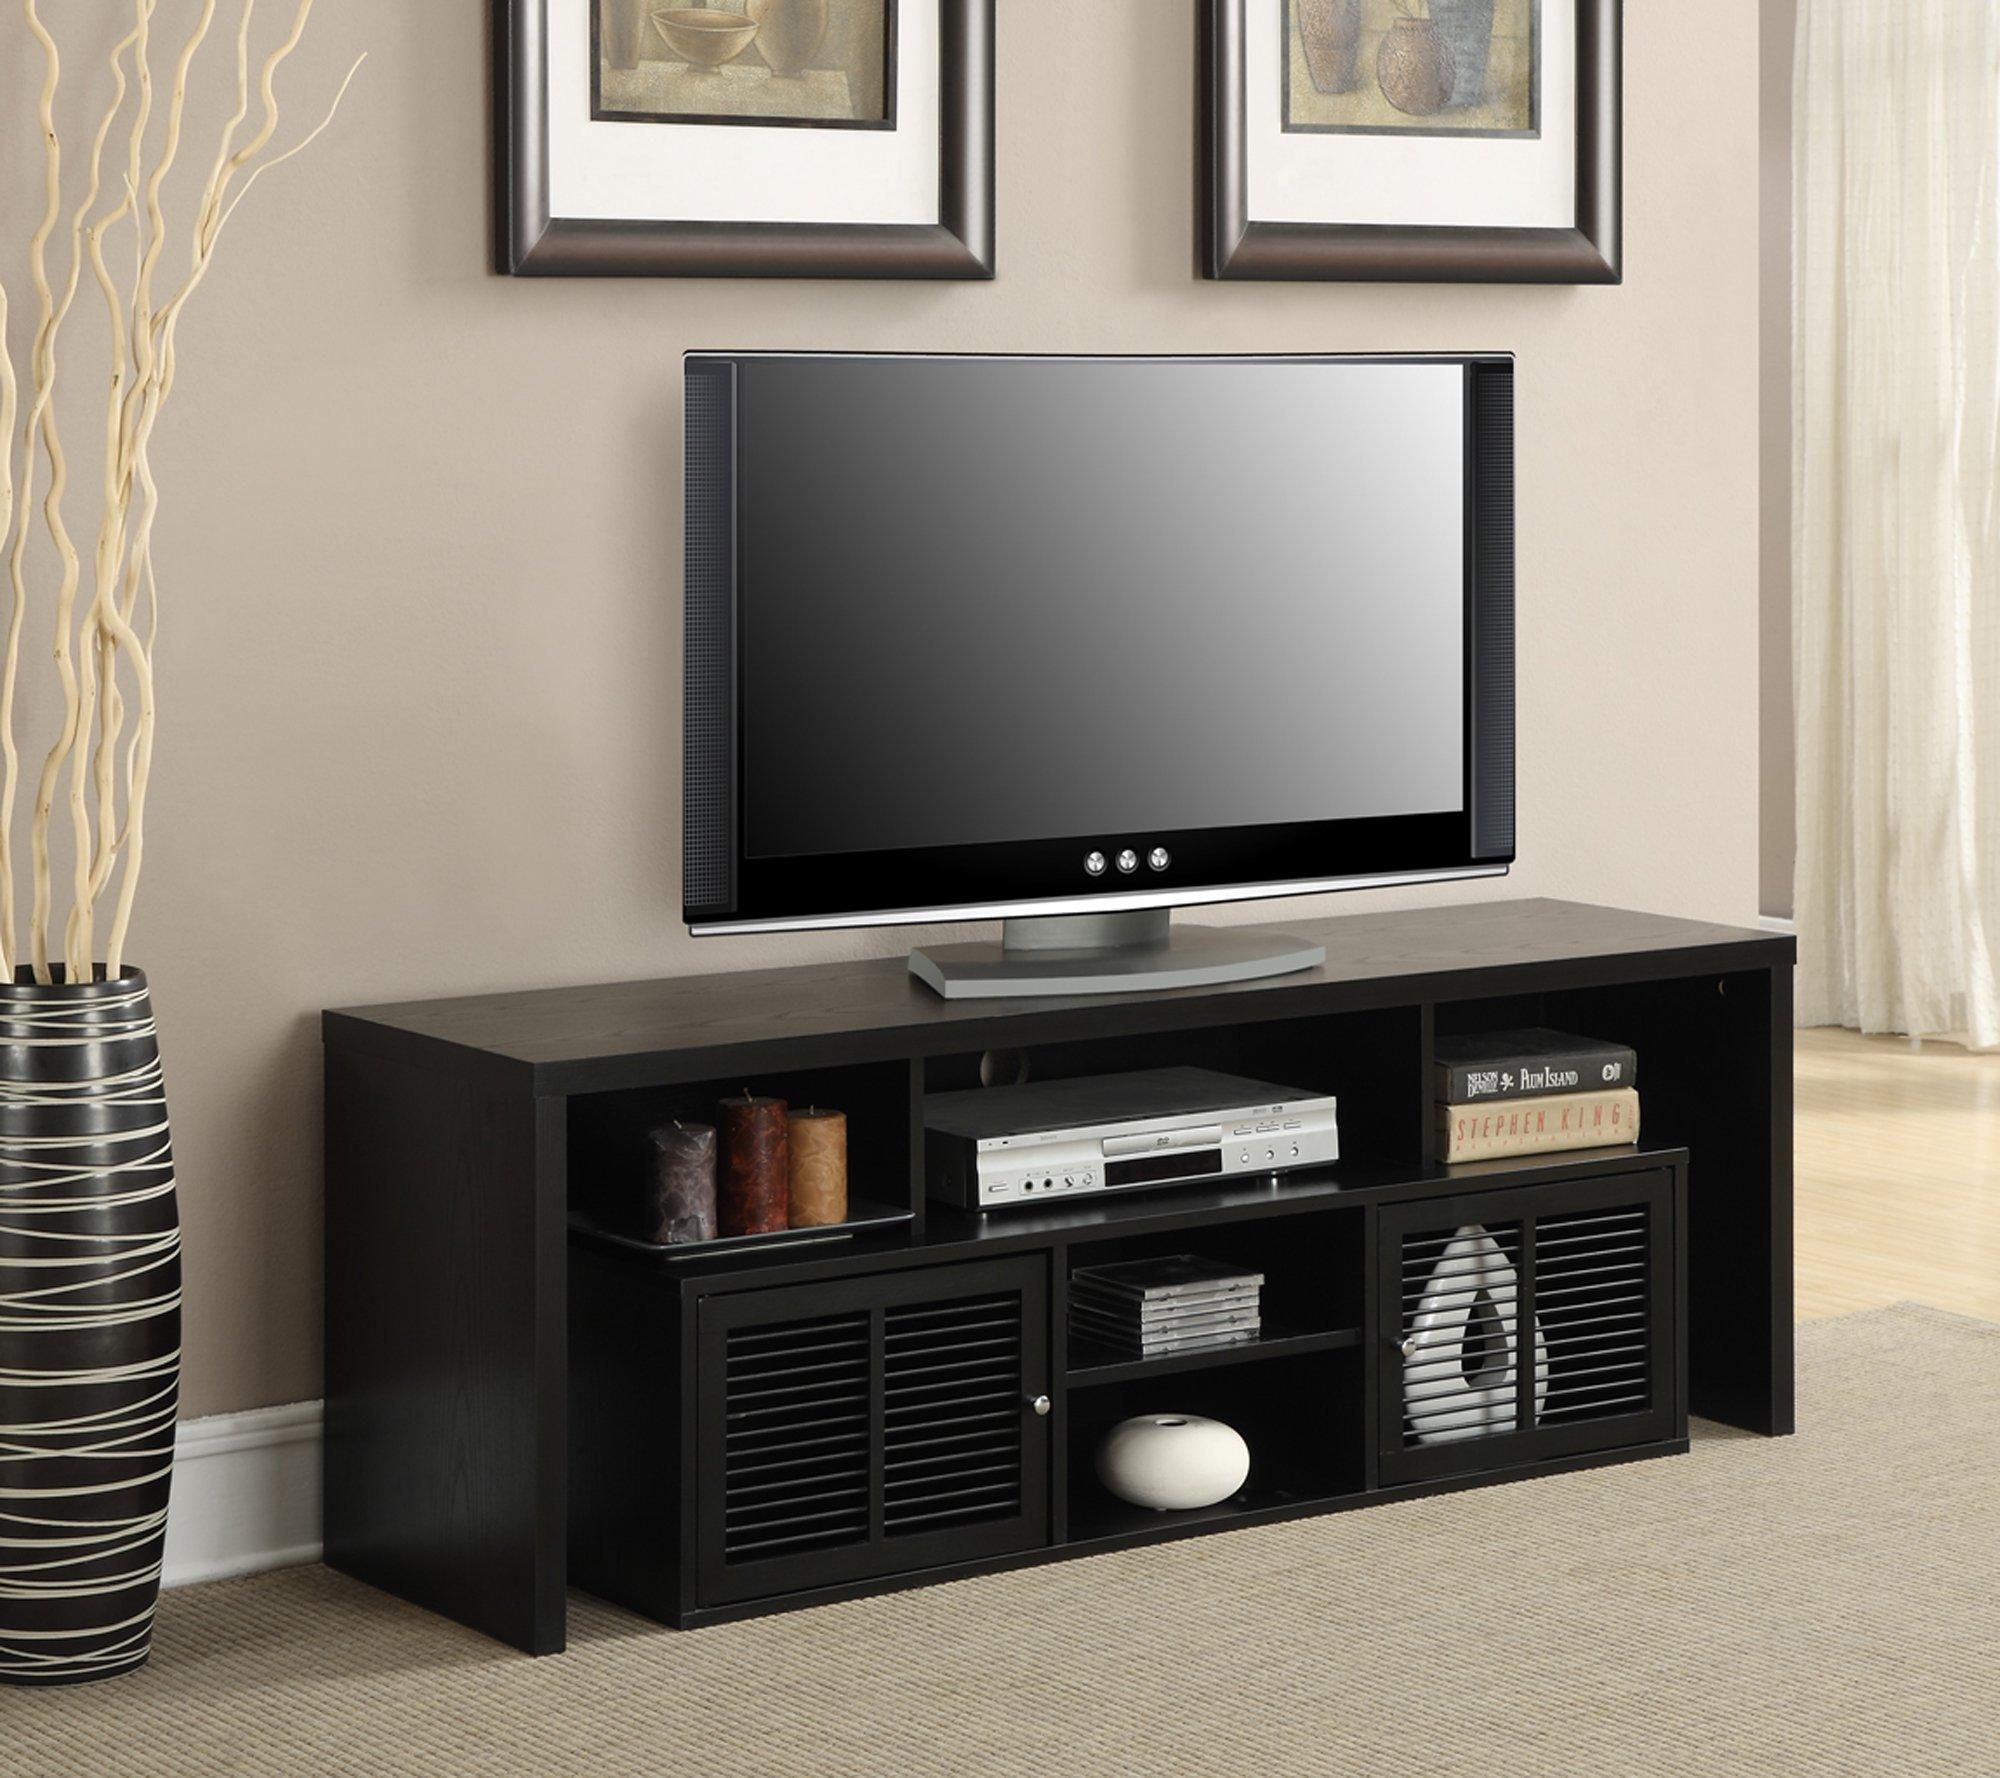 Convenience Concepts Designs2Go Modern Lexington 60-Inch TV Stand, Black by Convenience Concepts